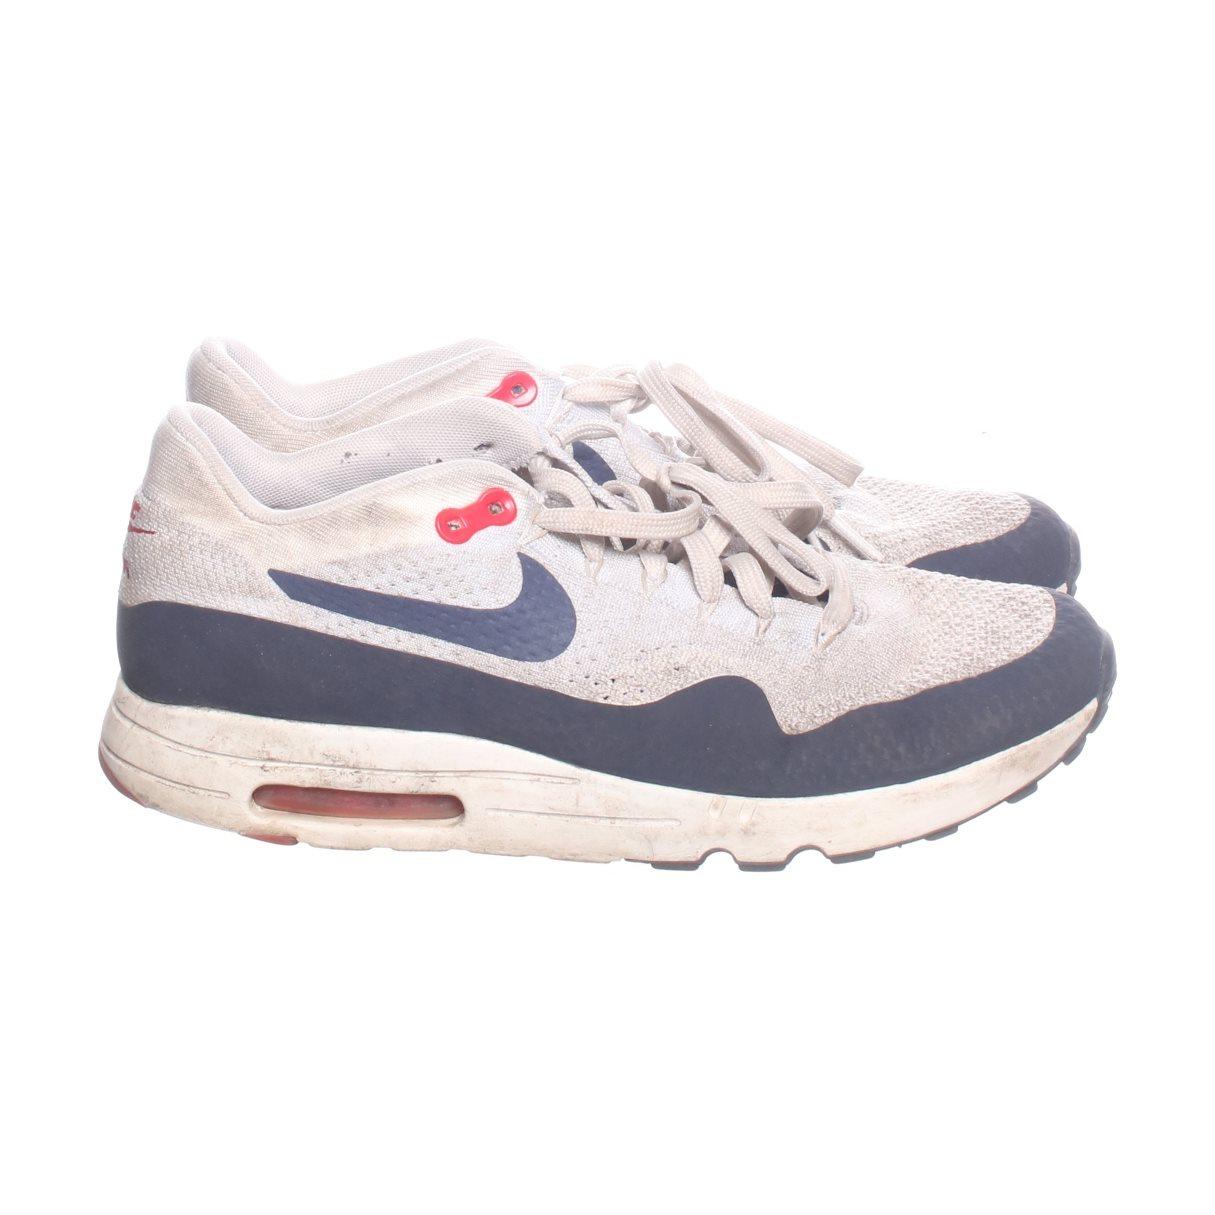 new york 702d4 80fe1 Nike, Sneakers, Strl  44, Air Max, Grå Marinblå